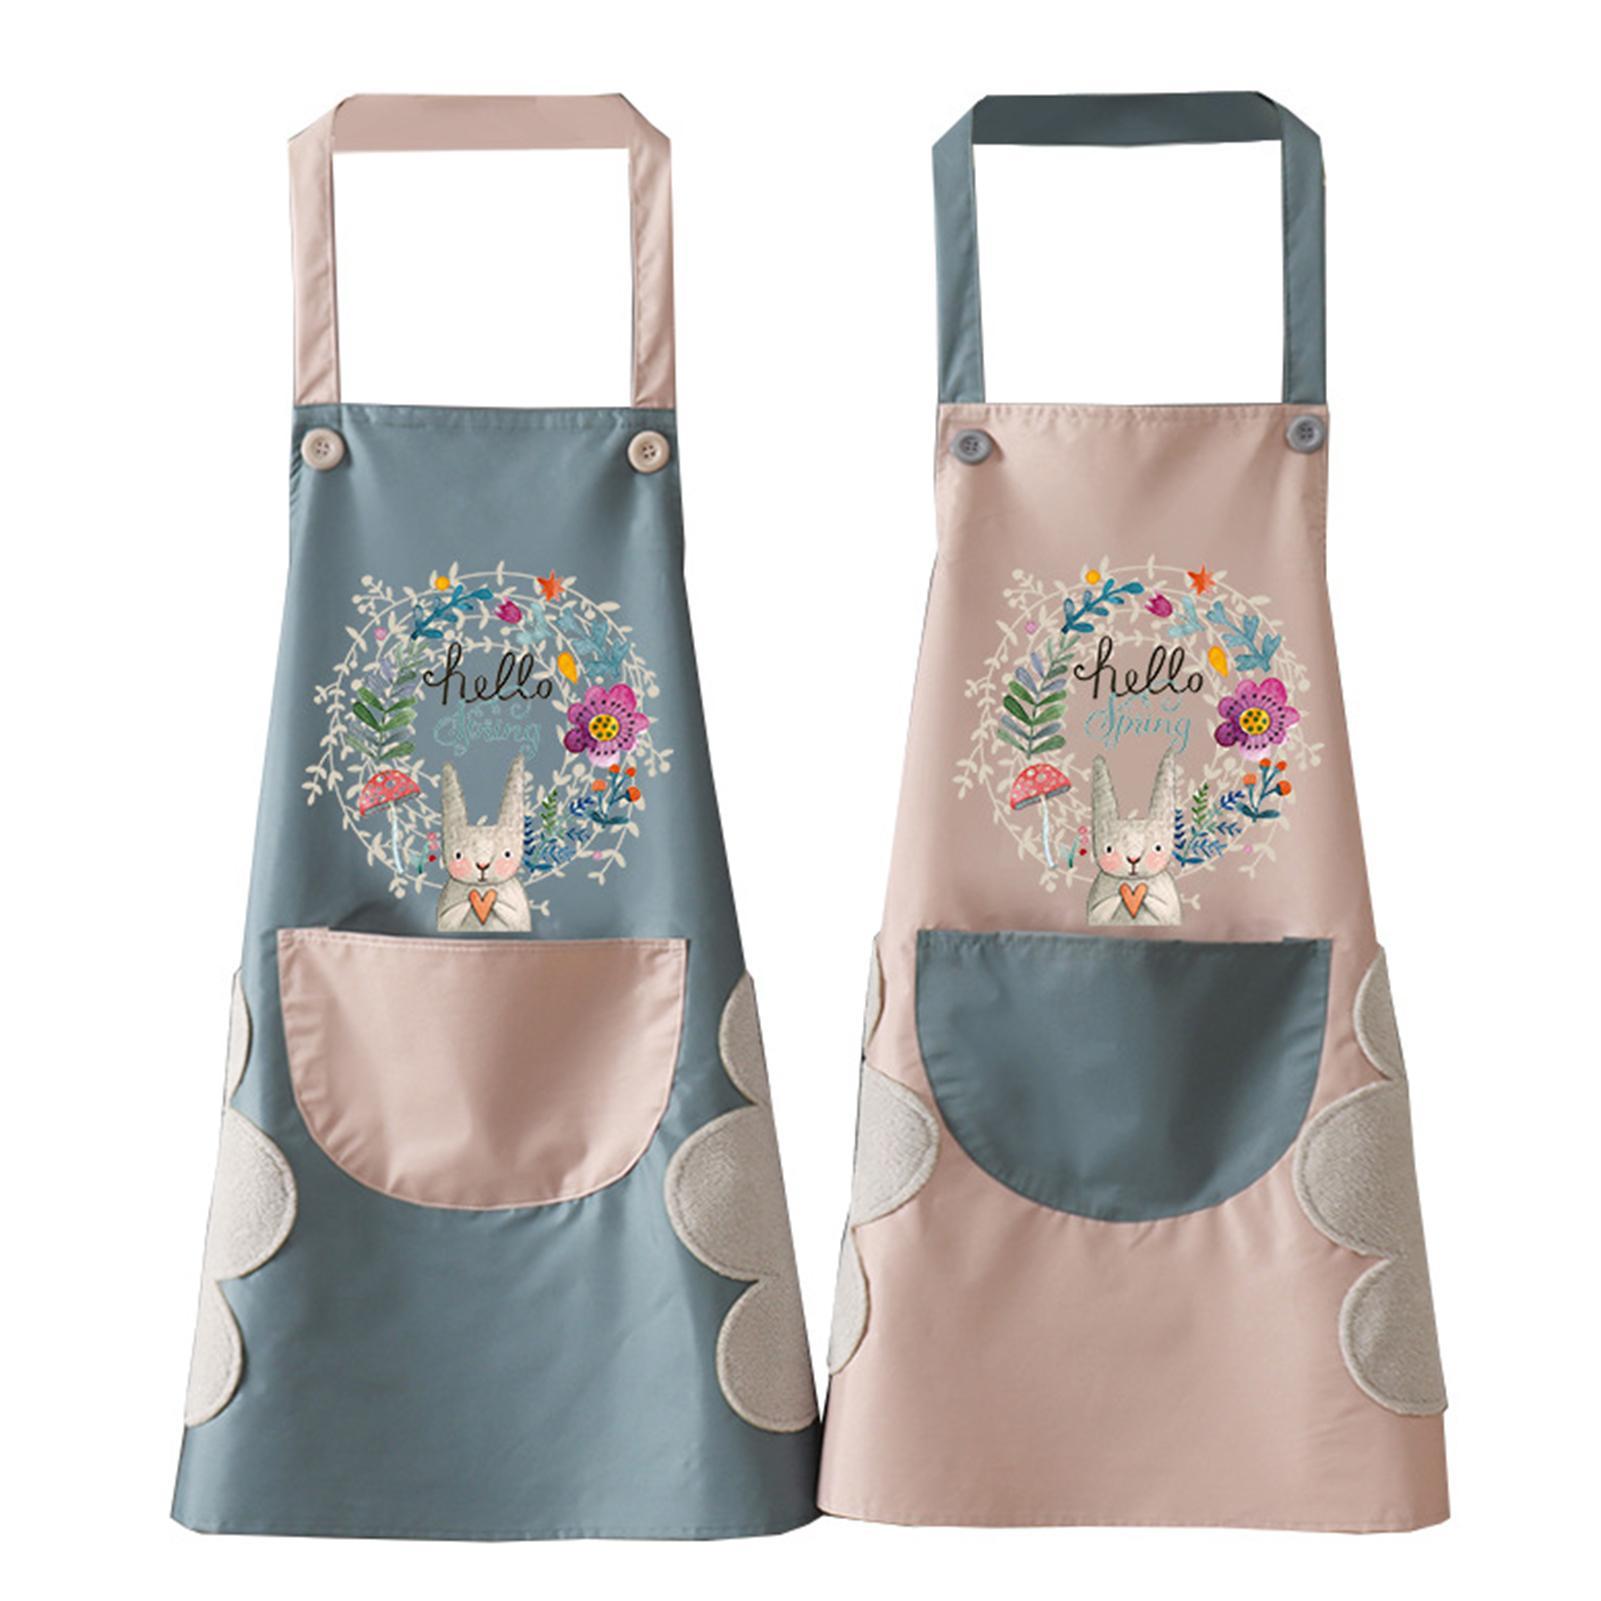 1Pcs Kitchen Wipeable Waterproof Oil Proof Cartoon Wreath Rabbit Kitchen Nail Shop Apron for Women Baking Accessories 90*70cm